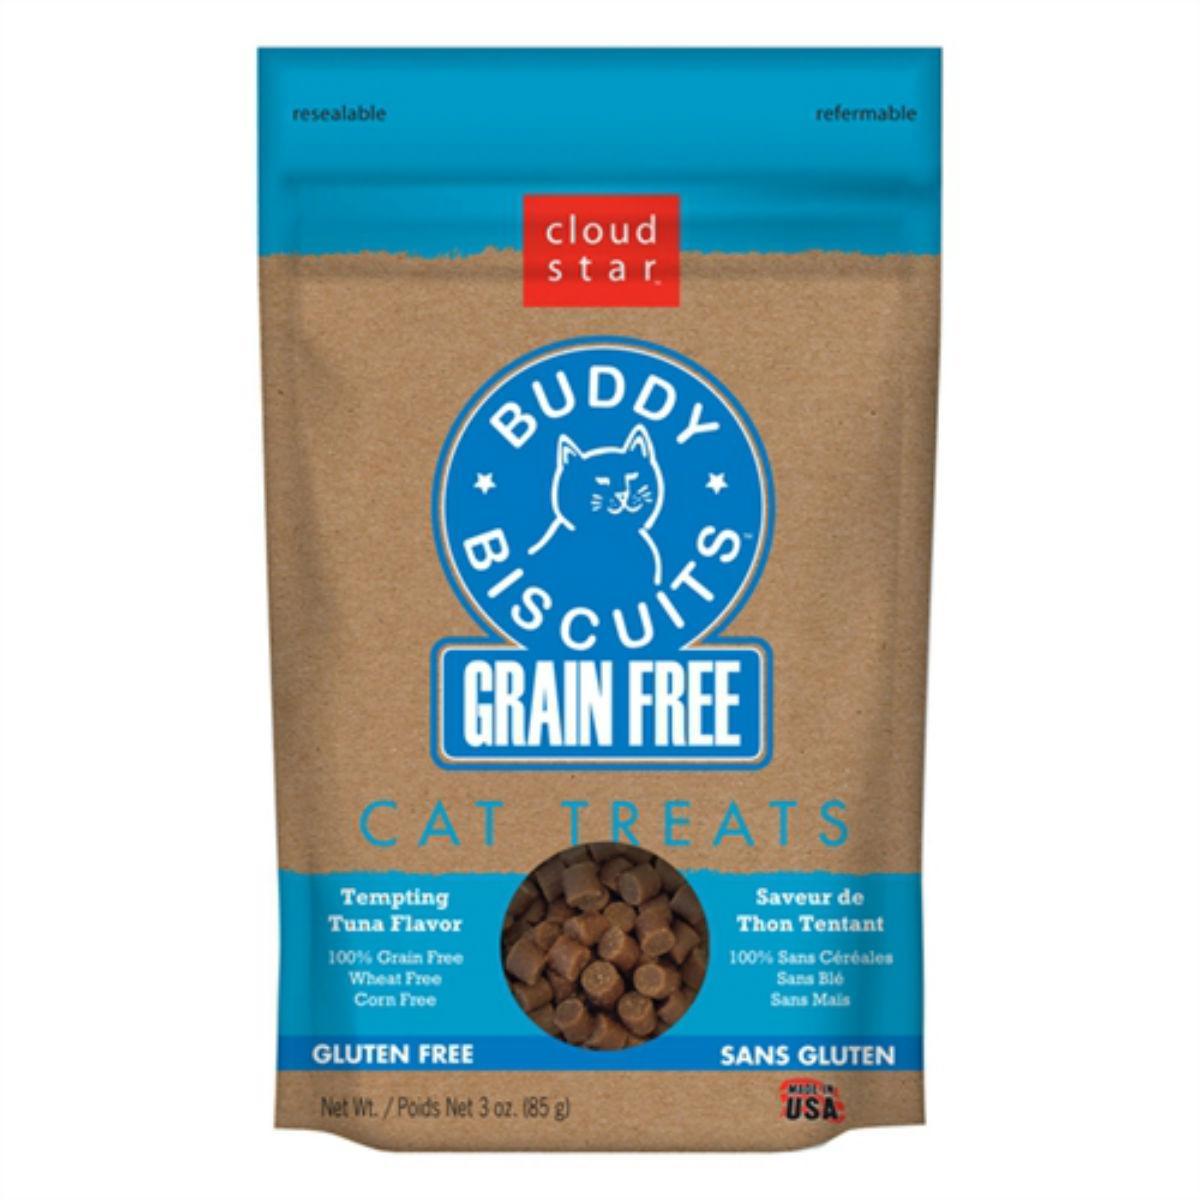 Buddy Biscuits Grain-Free Cat Treats - Tempting Tuna